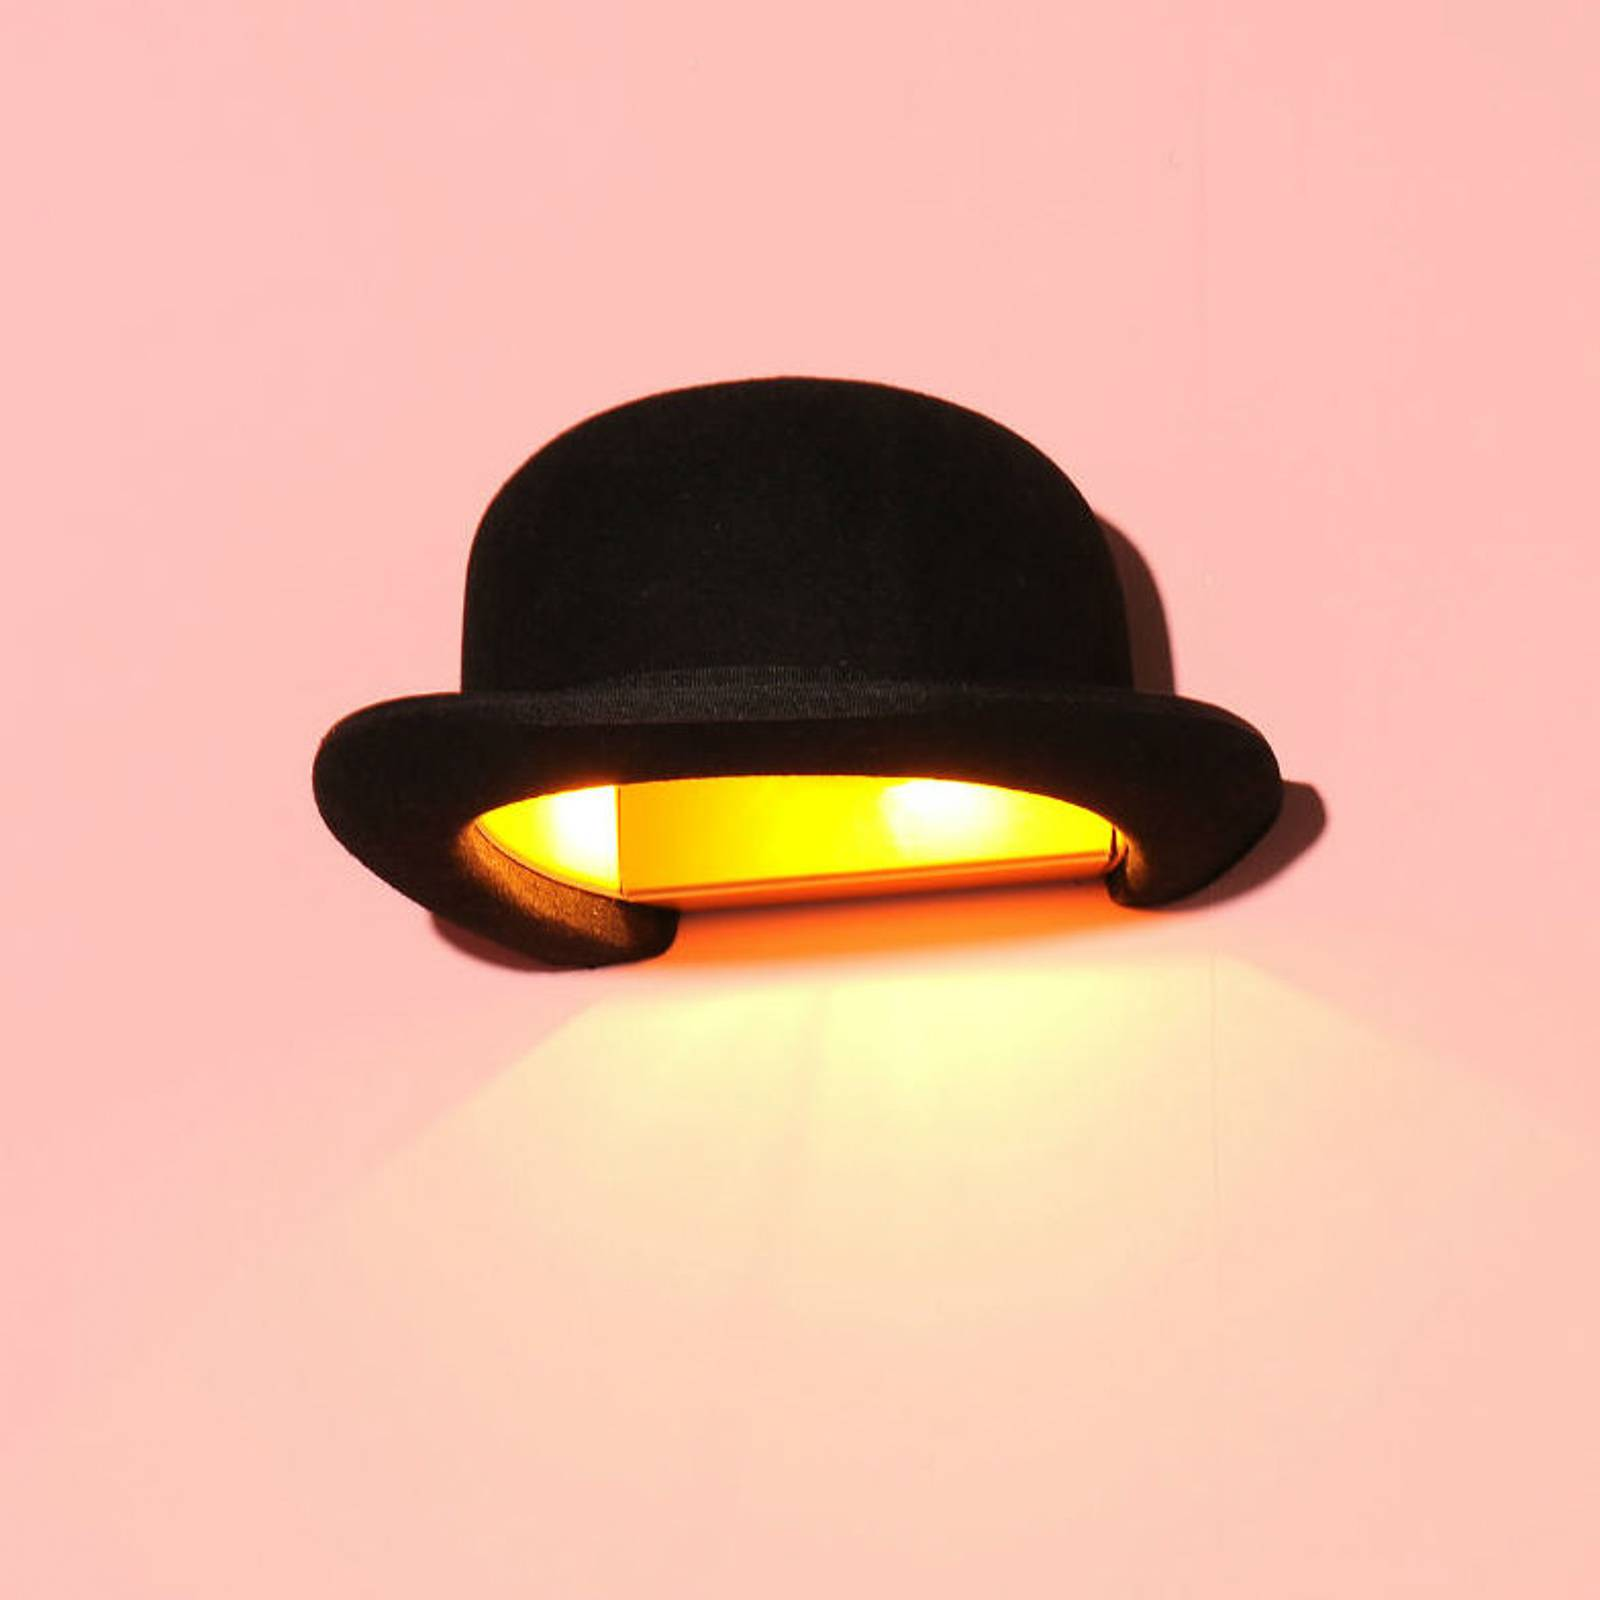 Innermost Jeeves Wall wandlamp van vilt